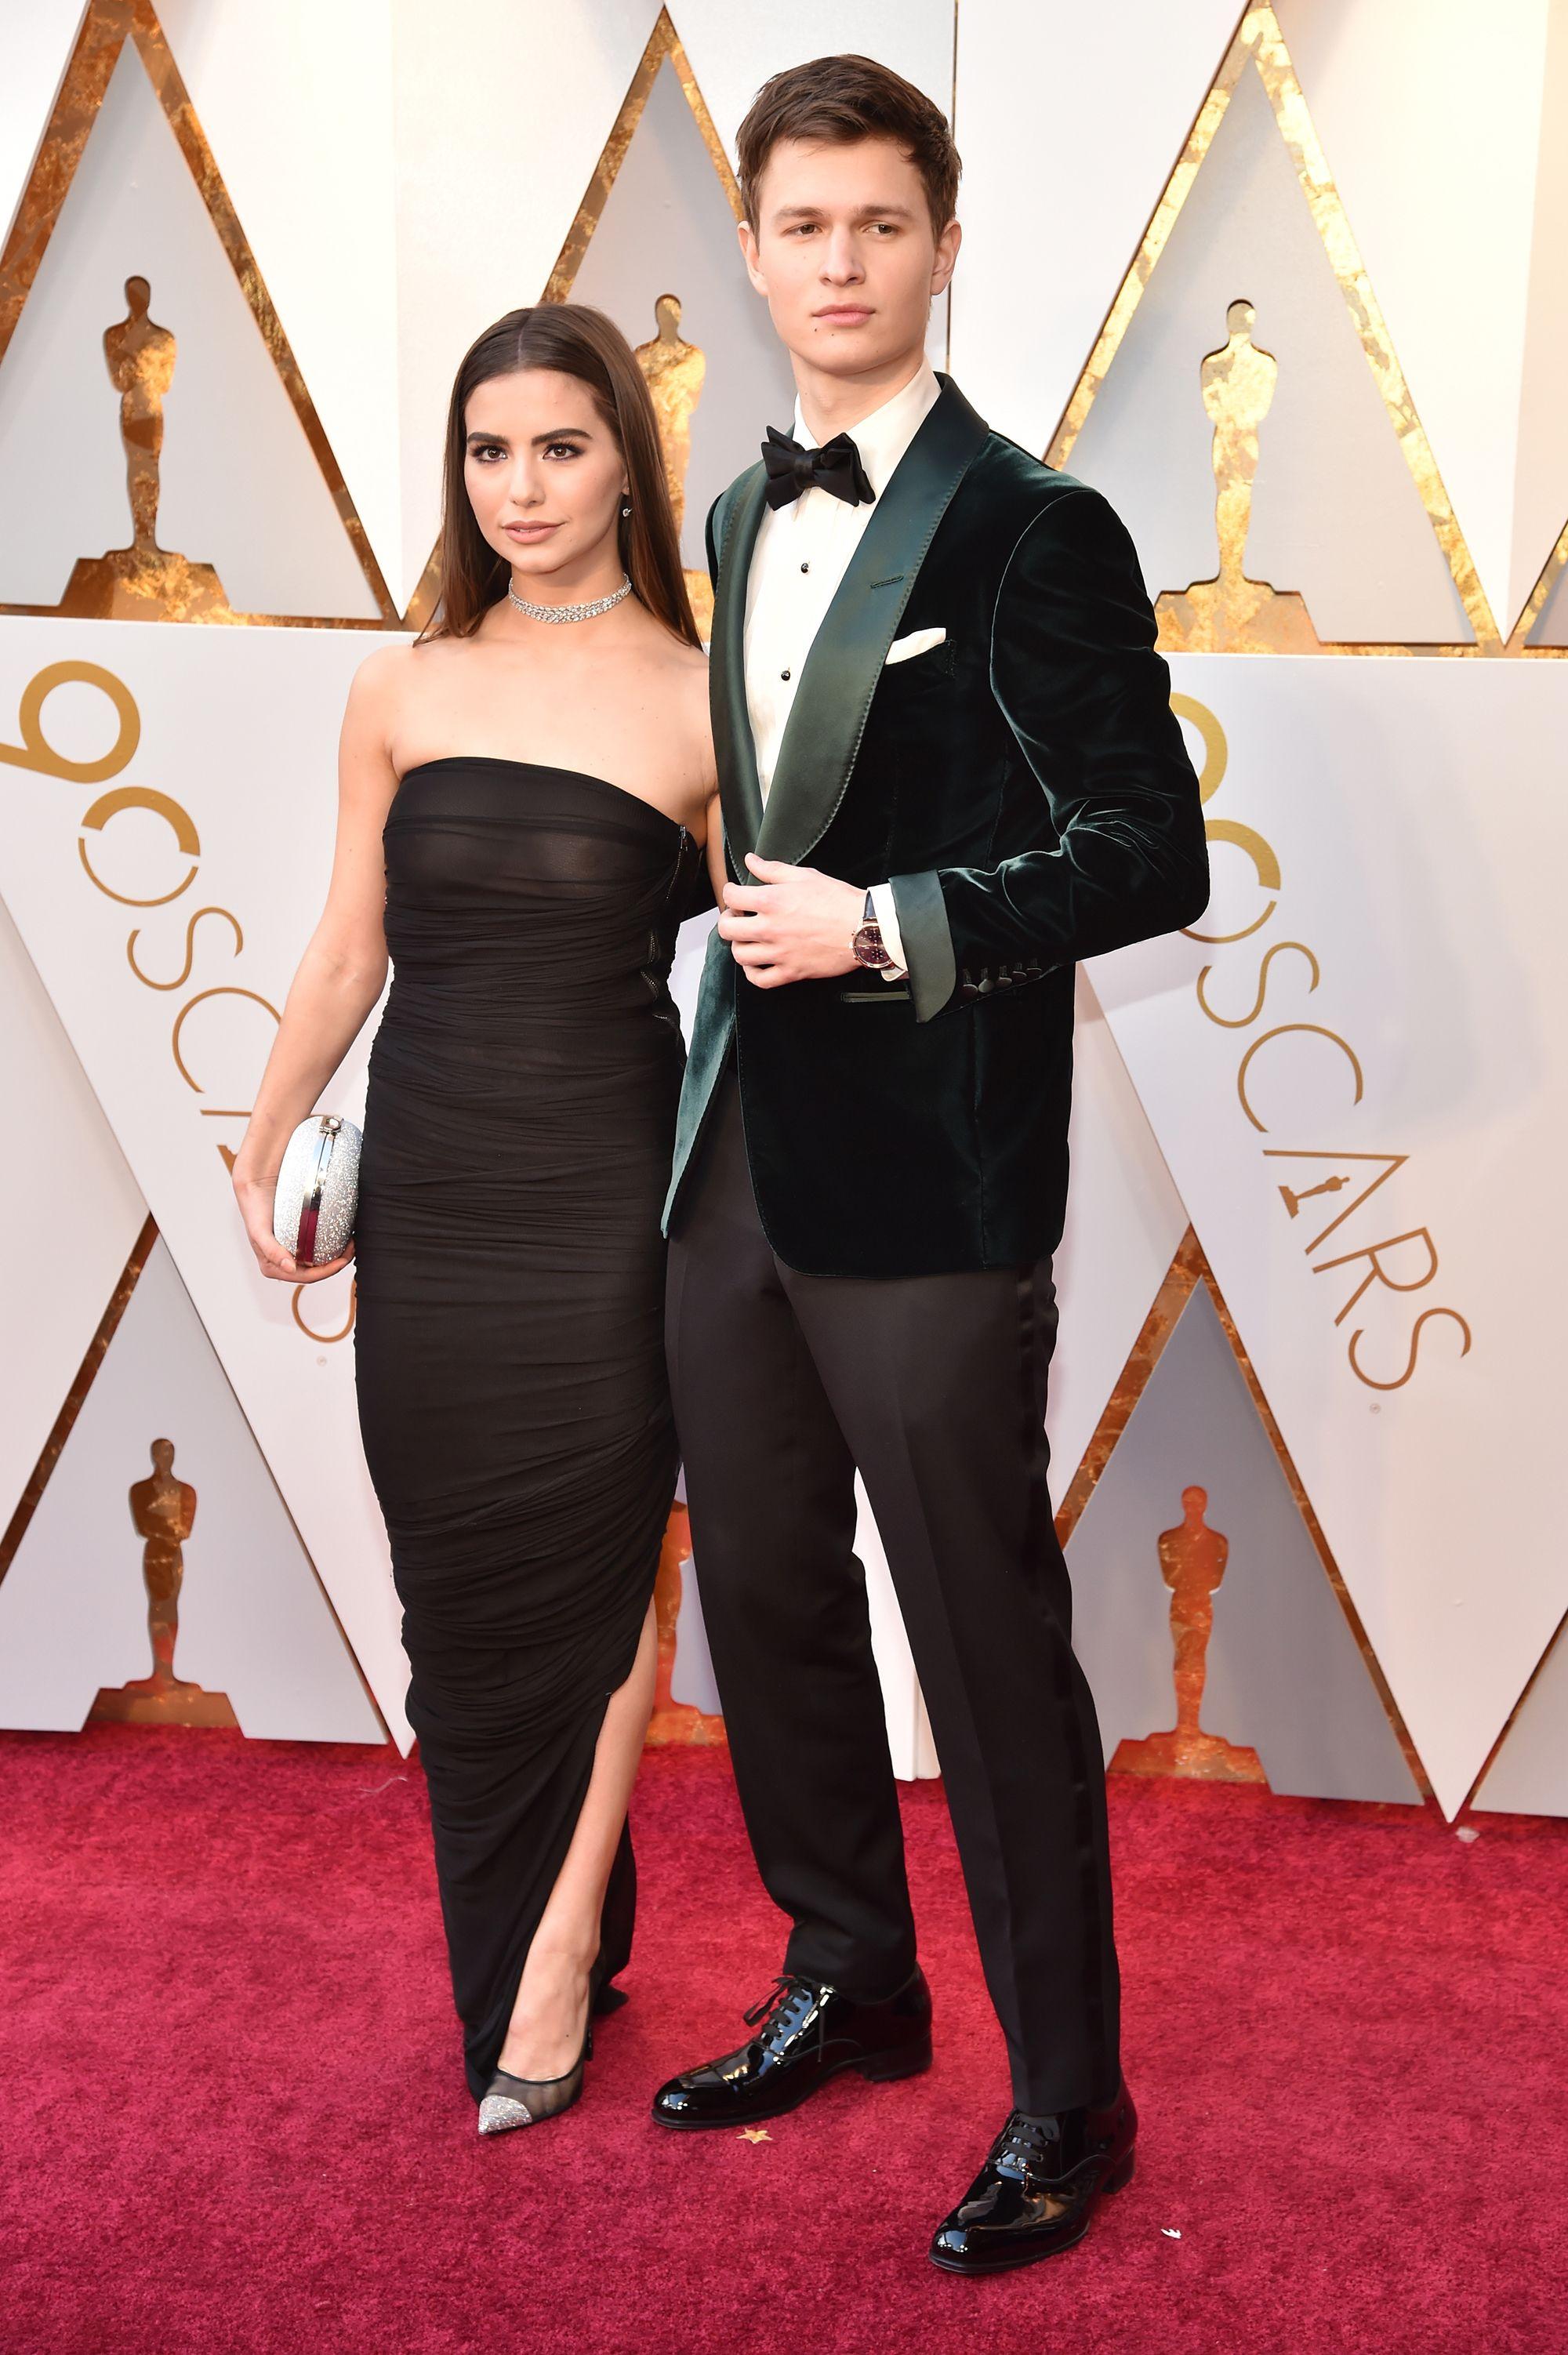 Ansel Elgort's Girlfriend Violetta Komyshan Had a Wardrobe Malfunction at the Oscars